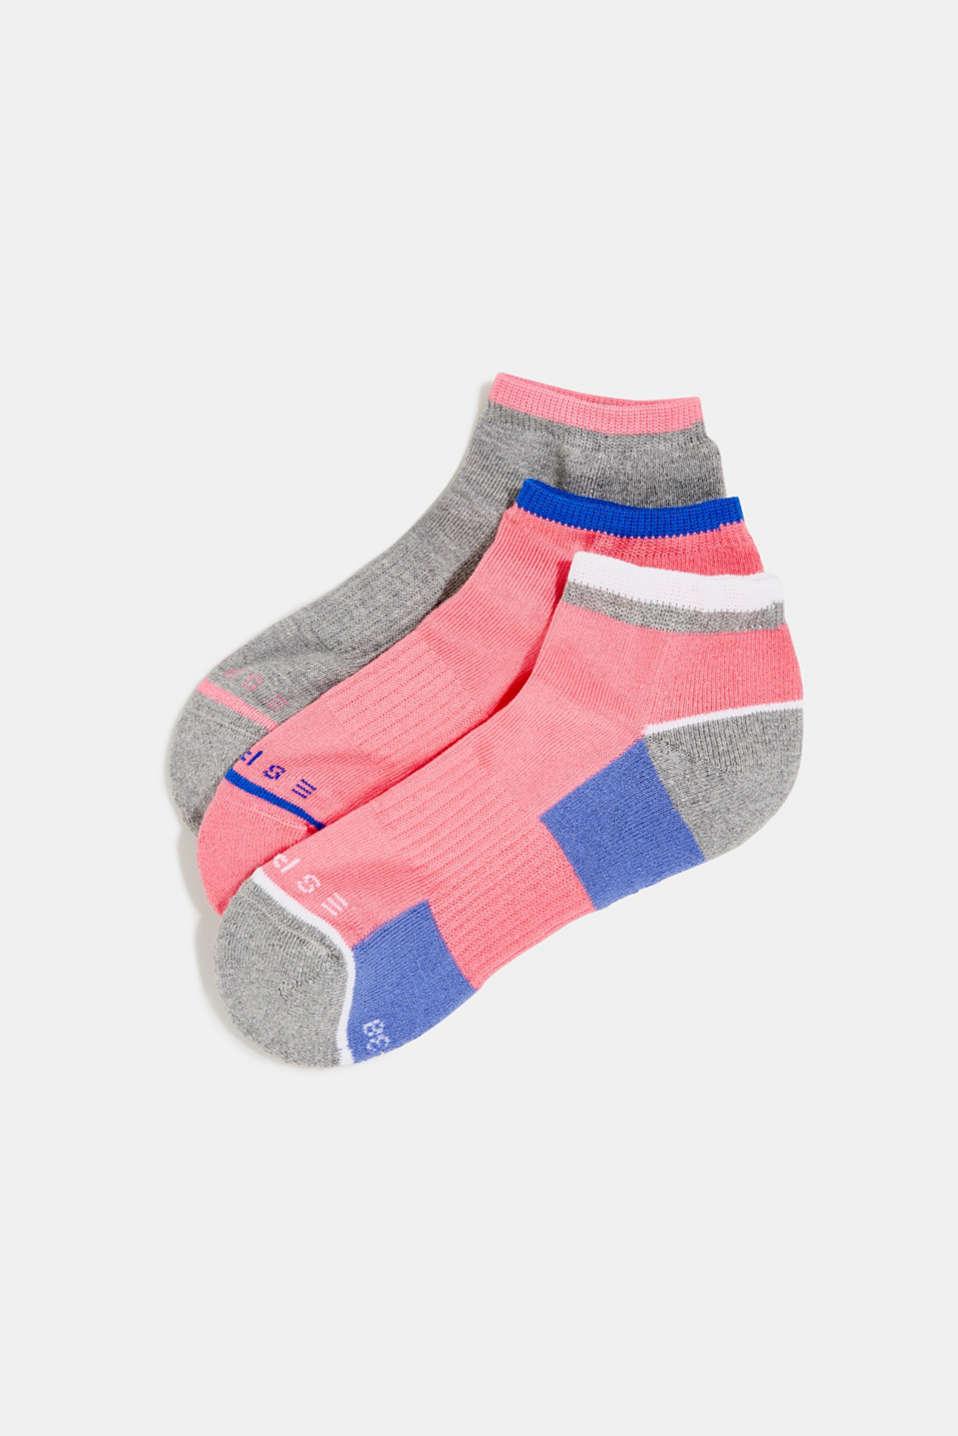 3-pair pack of blended cotton socks, SORTIMENT, detail image number 0